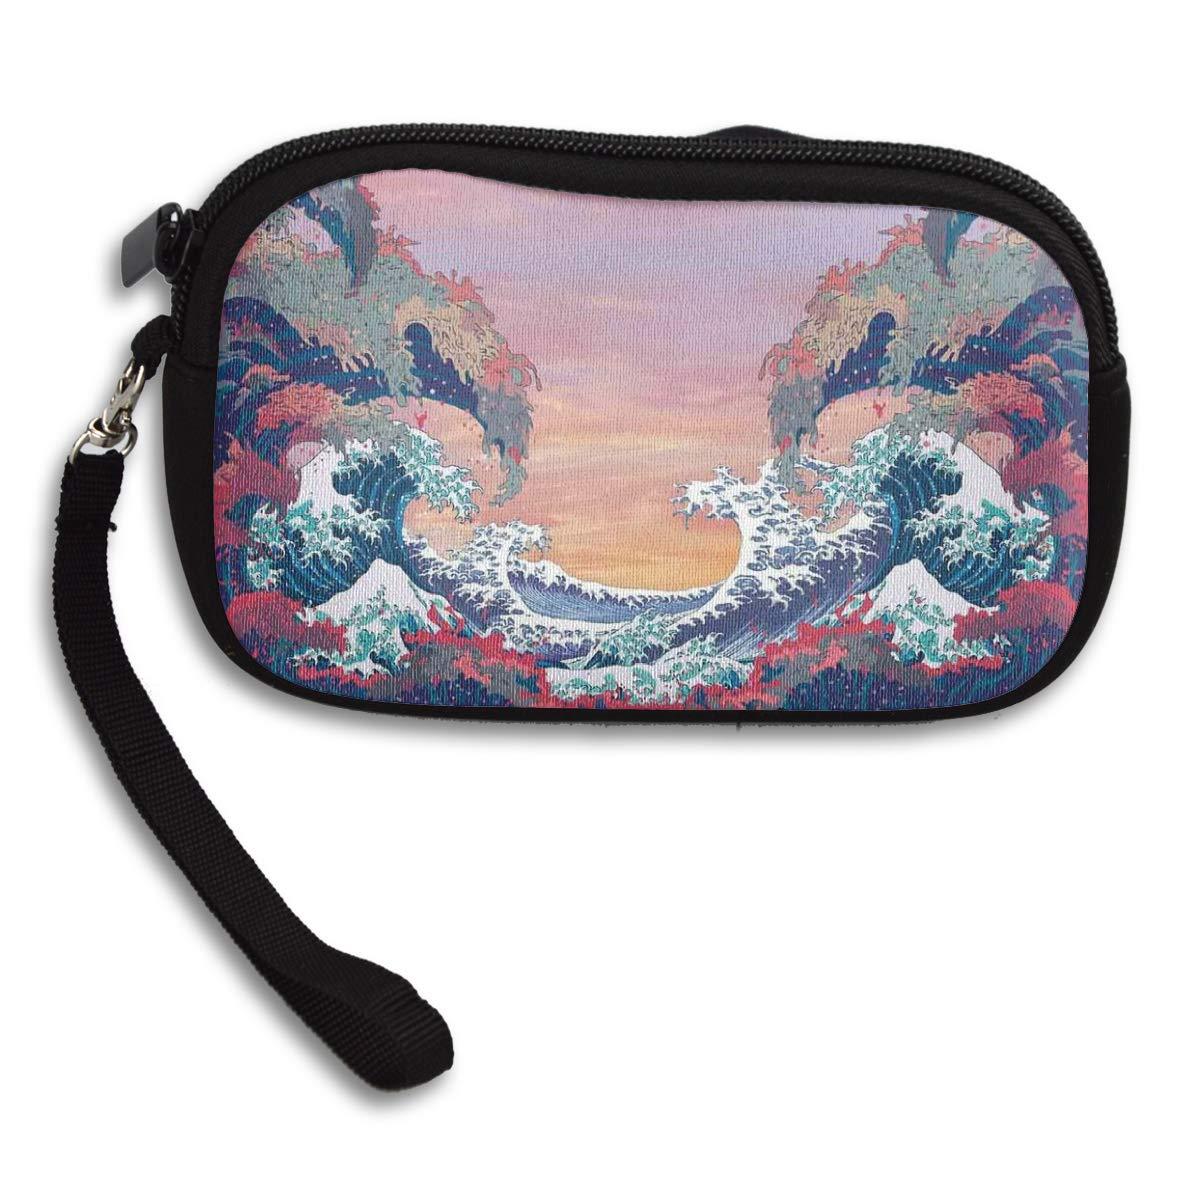 Sea Waves Ocean Modern Magic Art Coin Pouch Clutch Purse Wristlet Wallet Phone Card Holder Handbag